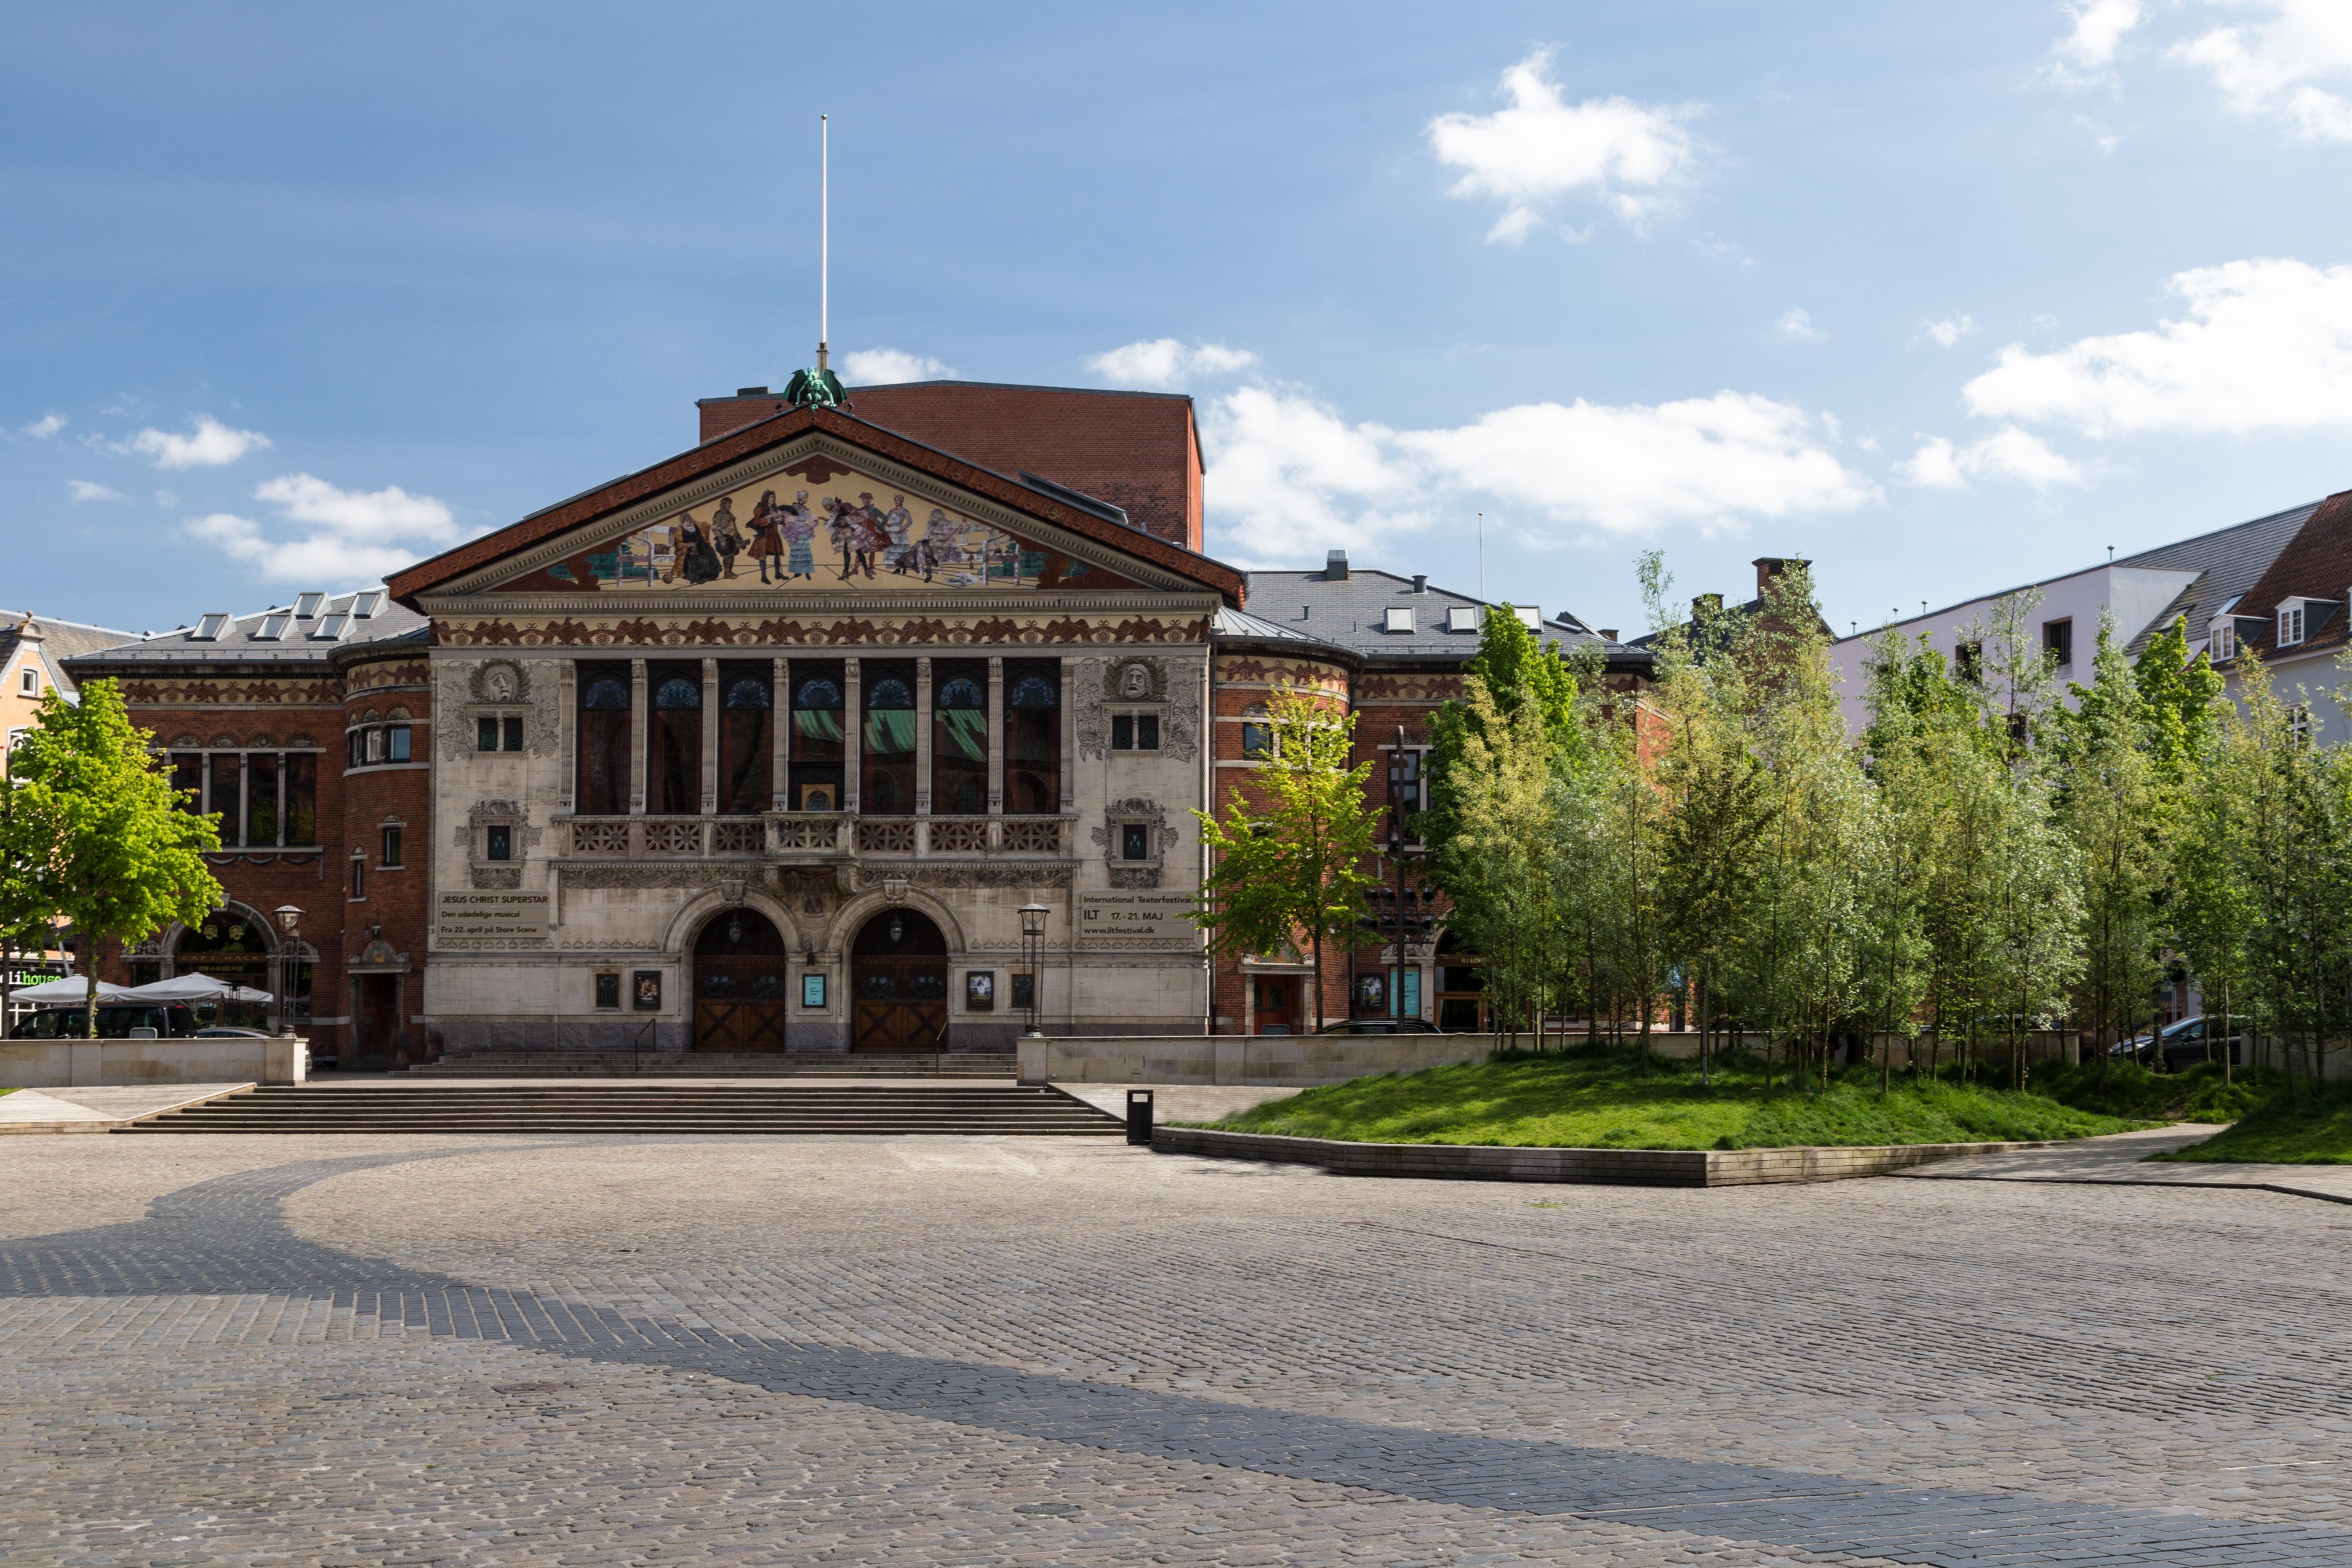 Studierabat 7 Studievenlige Steder I Aarhus Bobedredk